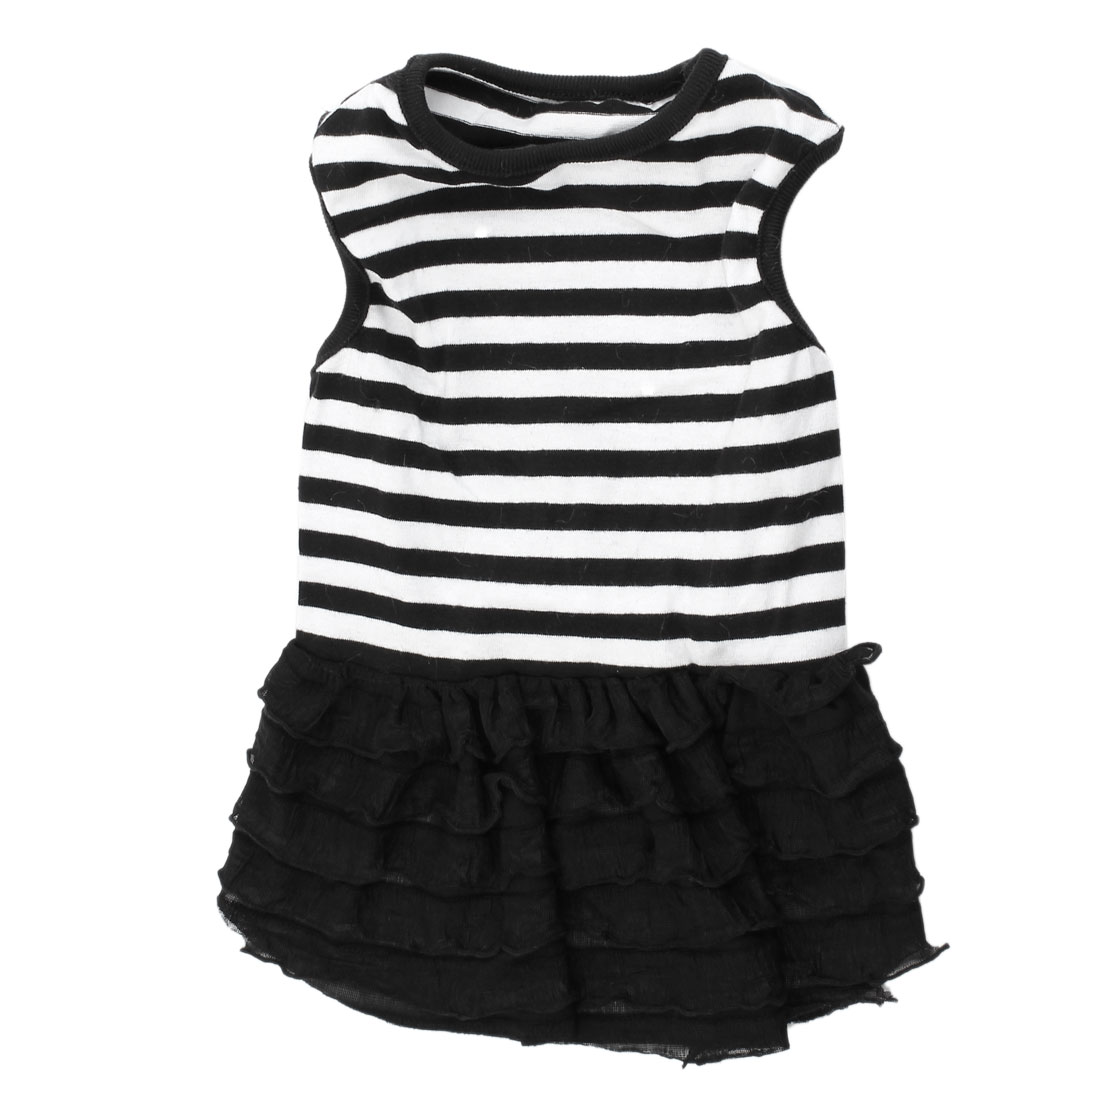 Tiered Sleeveless Stripe Printed Pet Dog Yorkie Dress Apparel Black White S